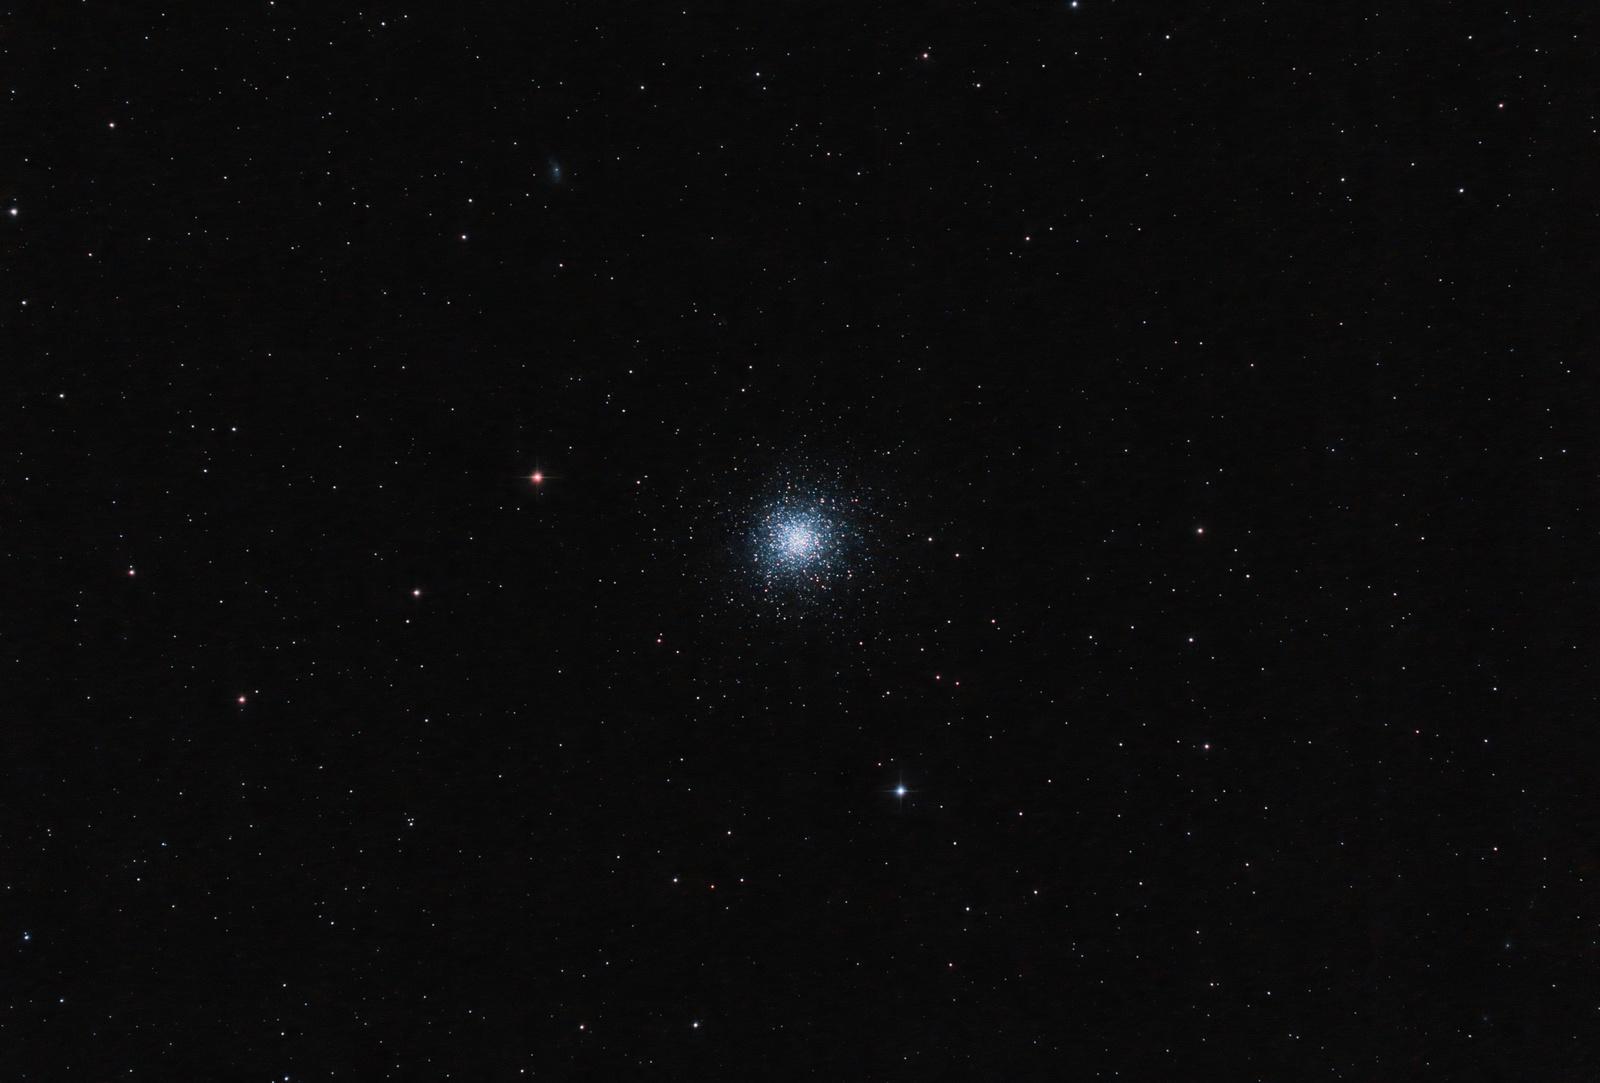 M31_Less_Denoise.thumb.jpg.c4635f0b16945dc4c1f5e2d91a0142e1.jpg